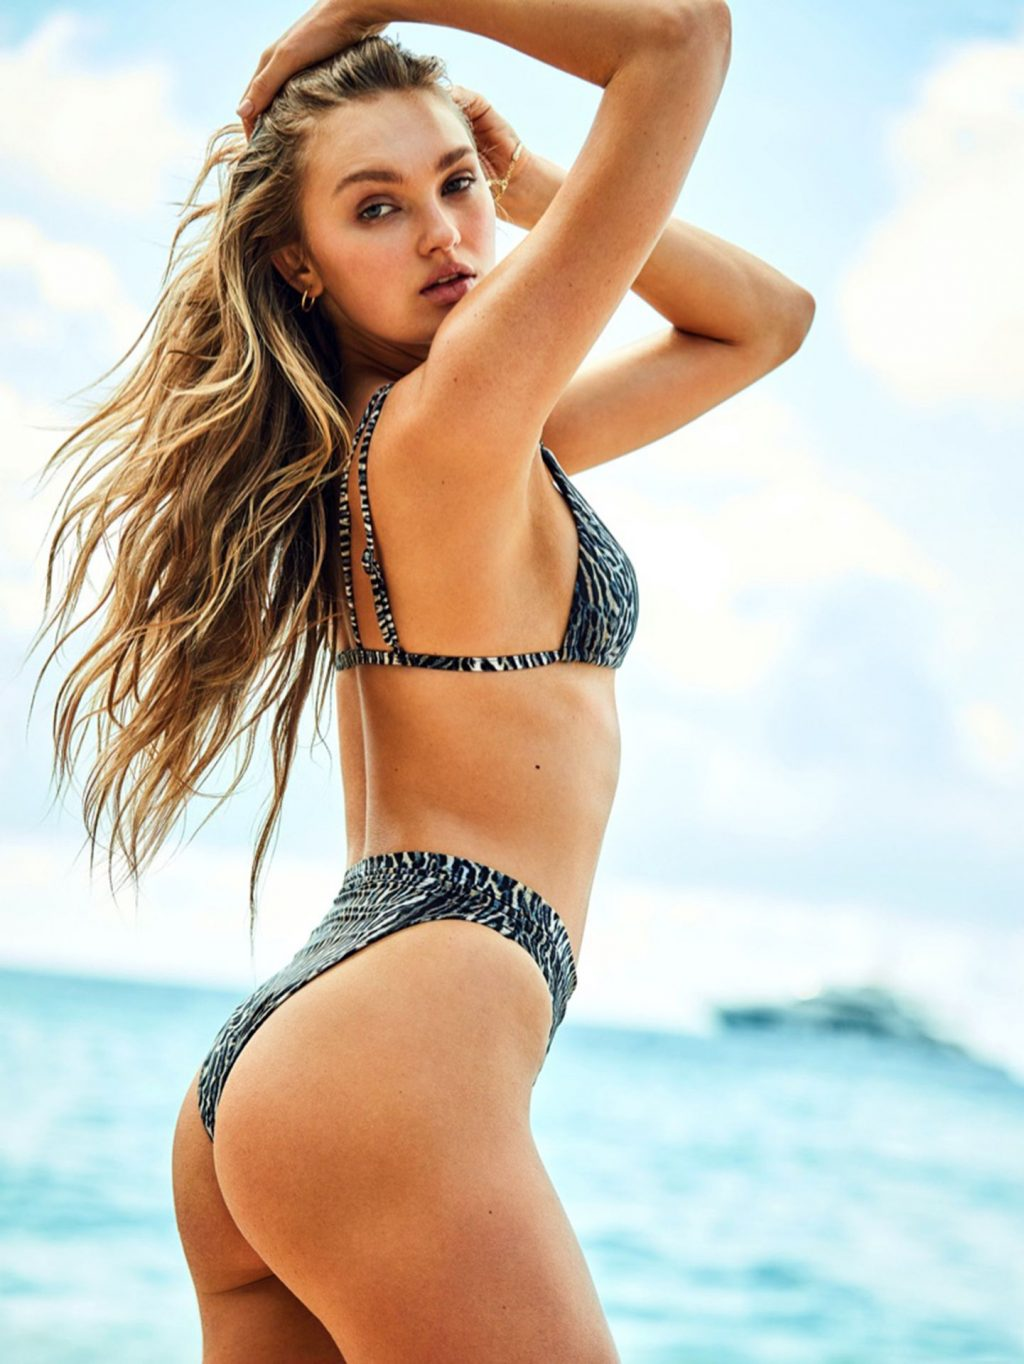 Romee Stridj Poses for Victoria's Secret Brand's New Swimwear Campaign (11 Photos)